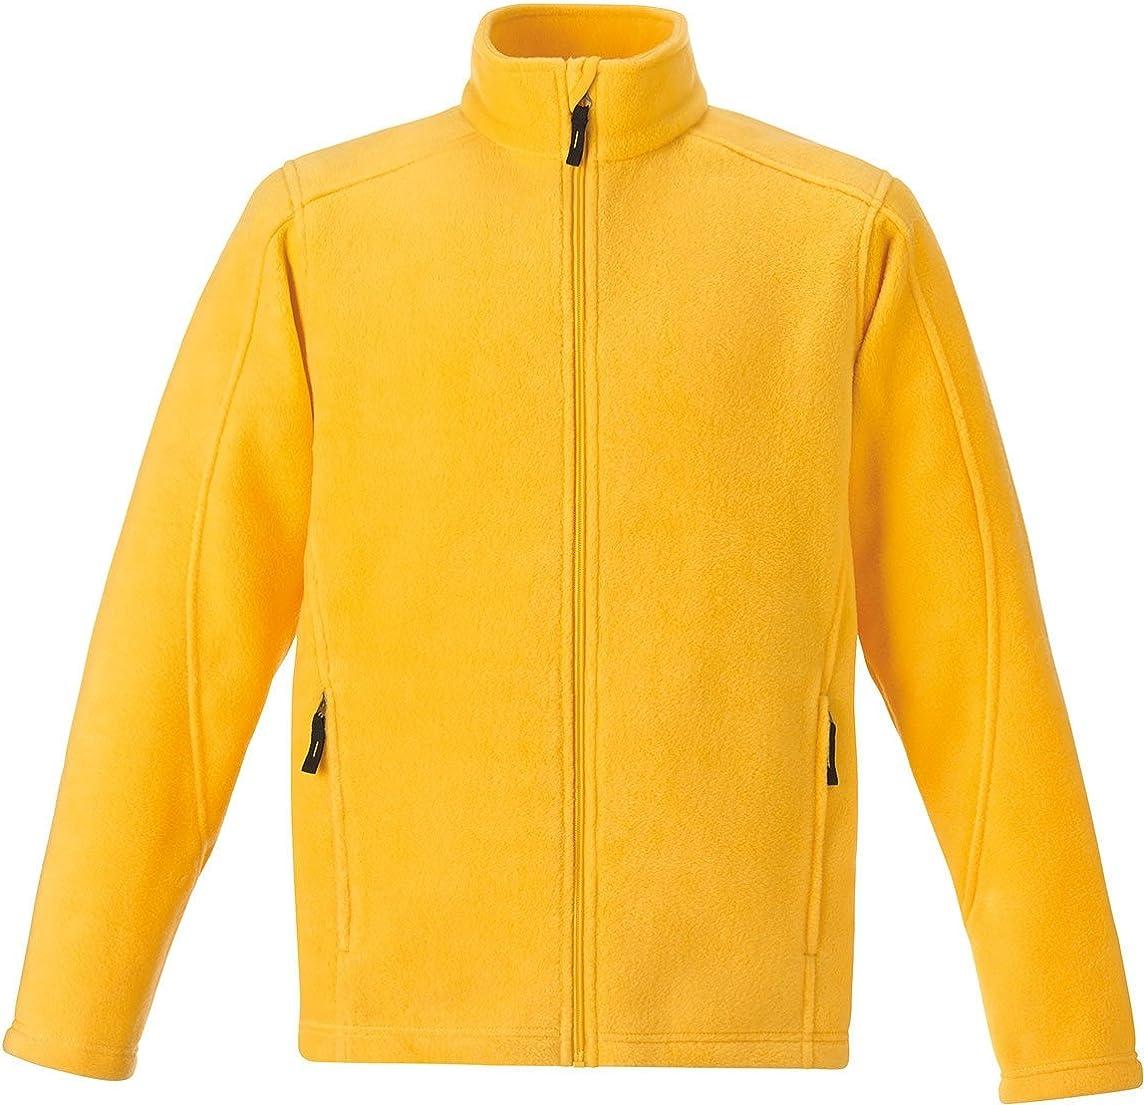 Ash City Core 365 Core 365 Journey/Mens Anti-Pill Fleece Jacket